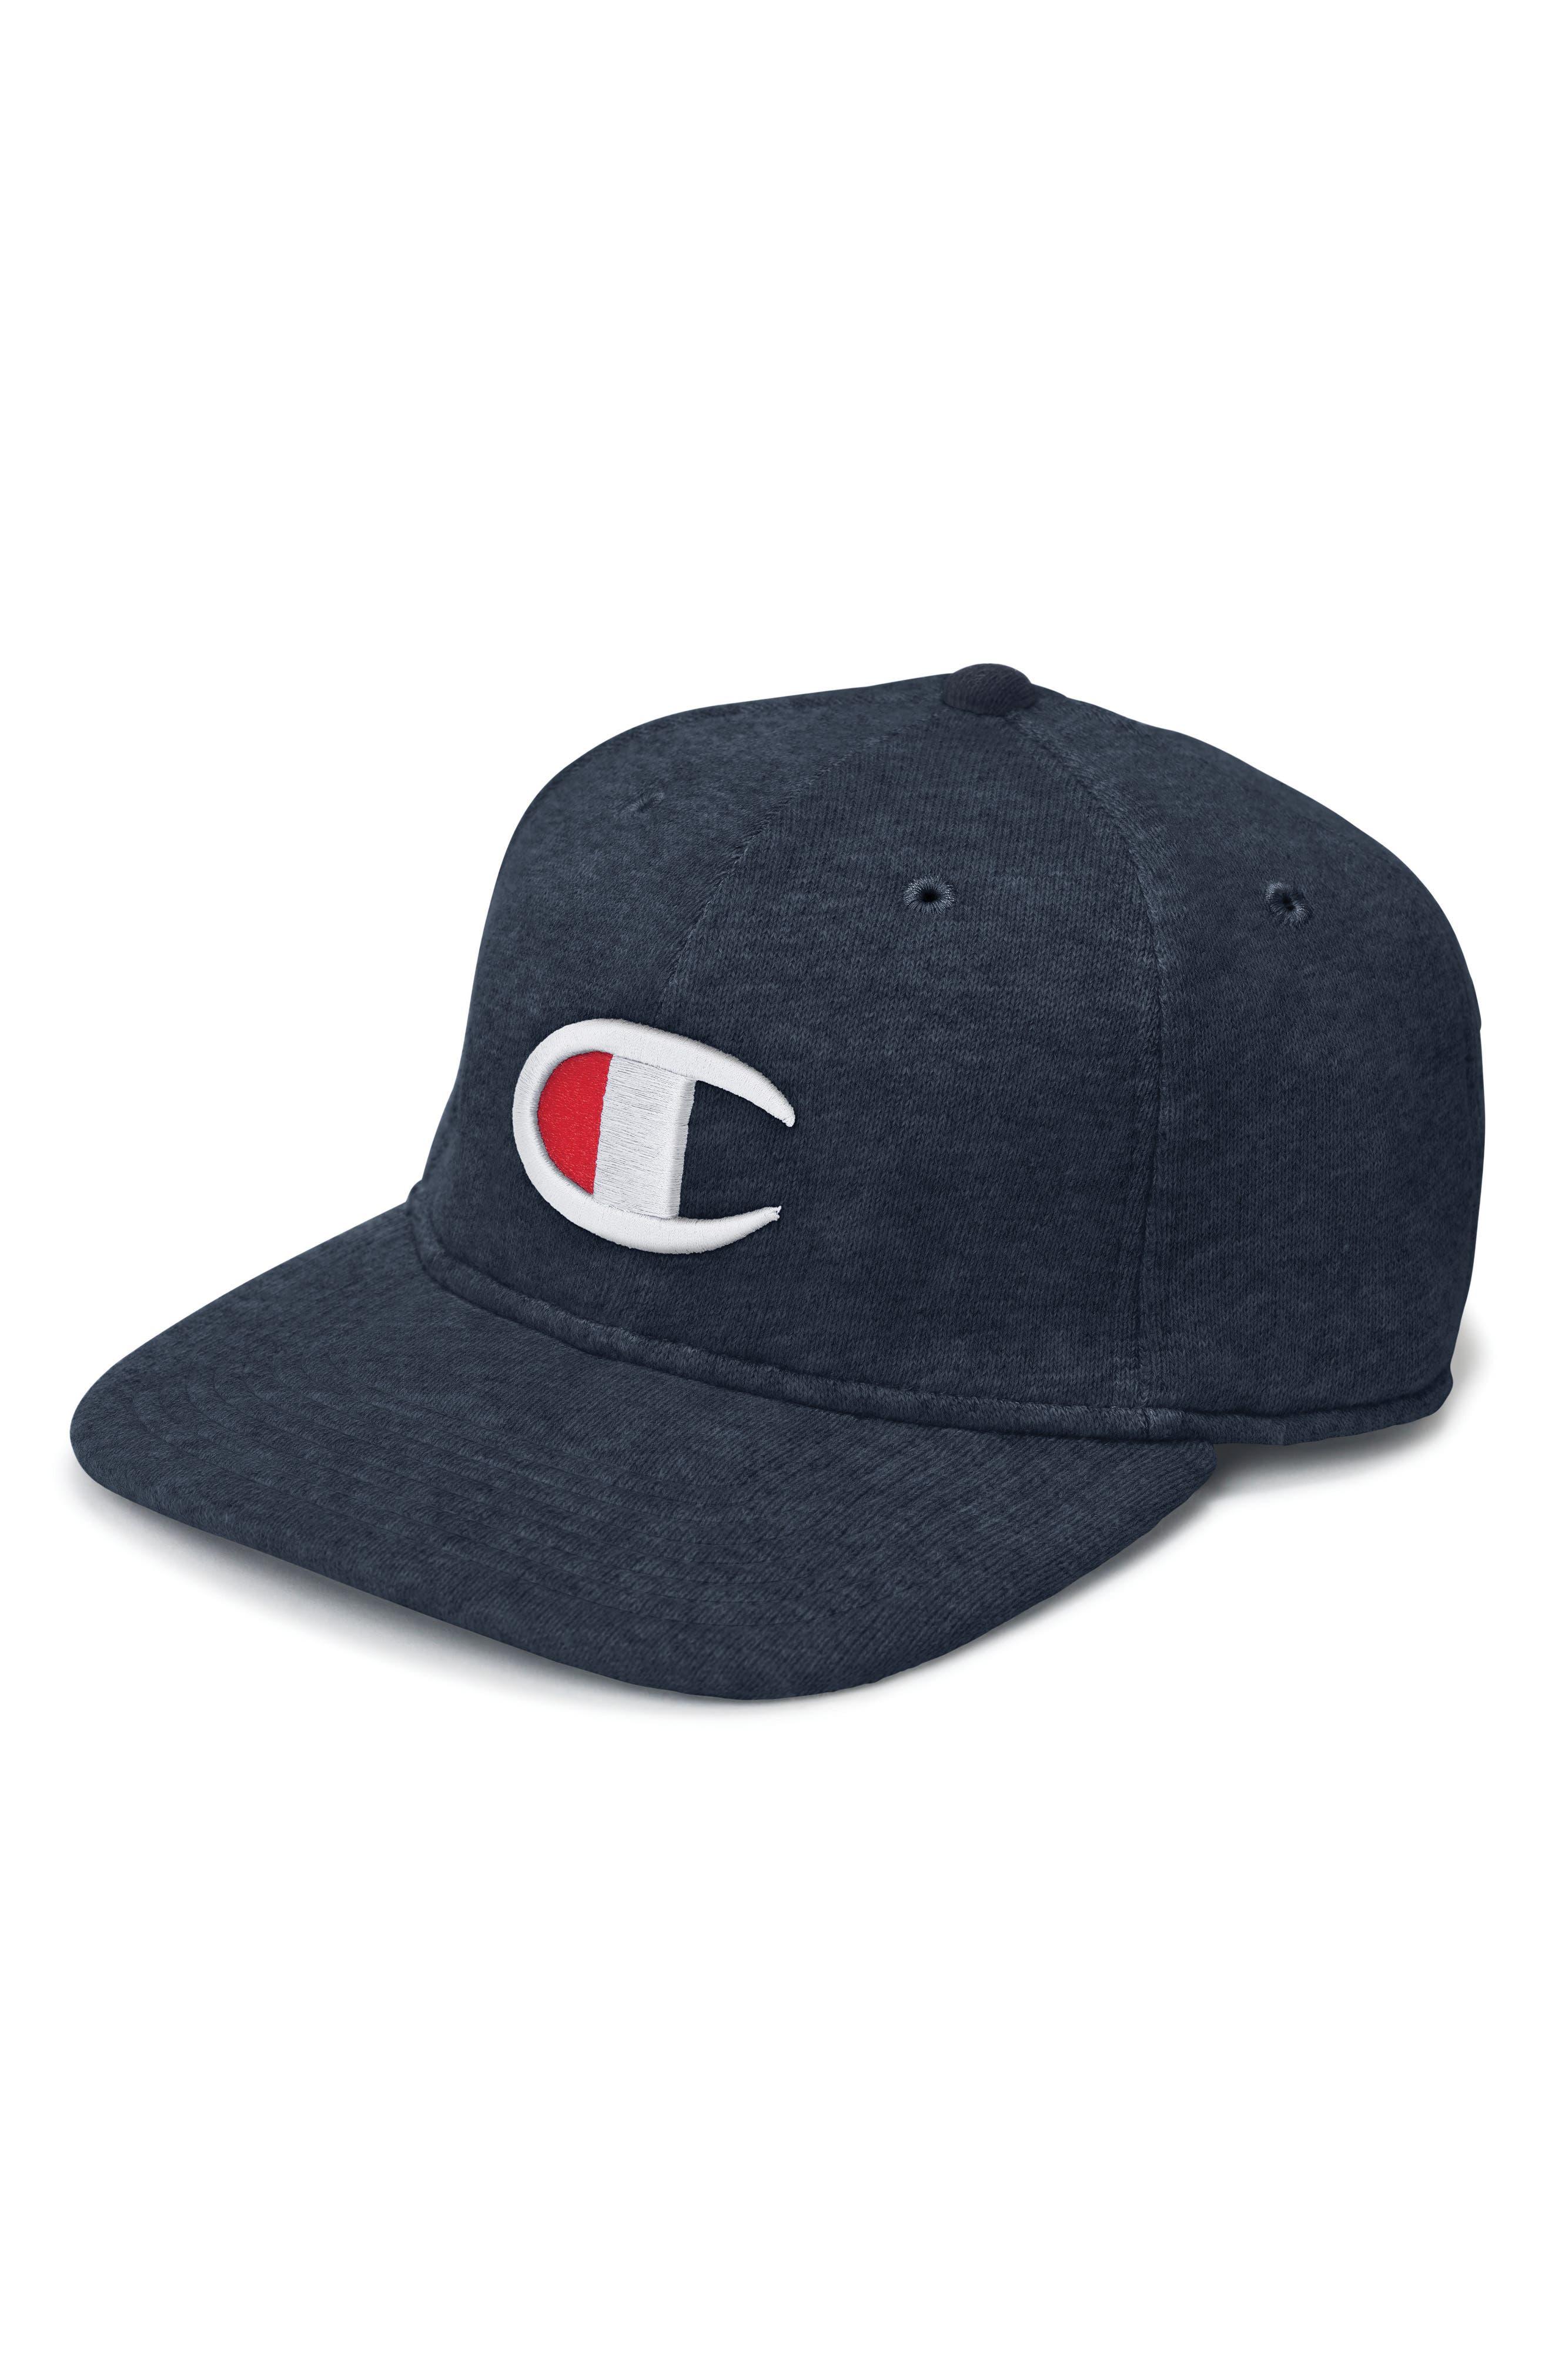 Reverse Weave Baseball Cap,                             Main thumbnail 1, color,                             NAVY